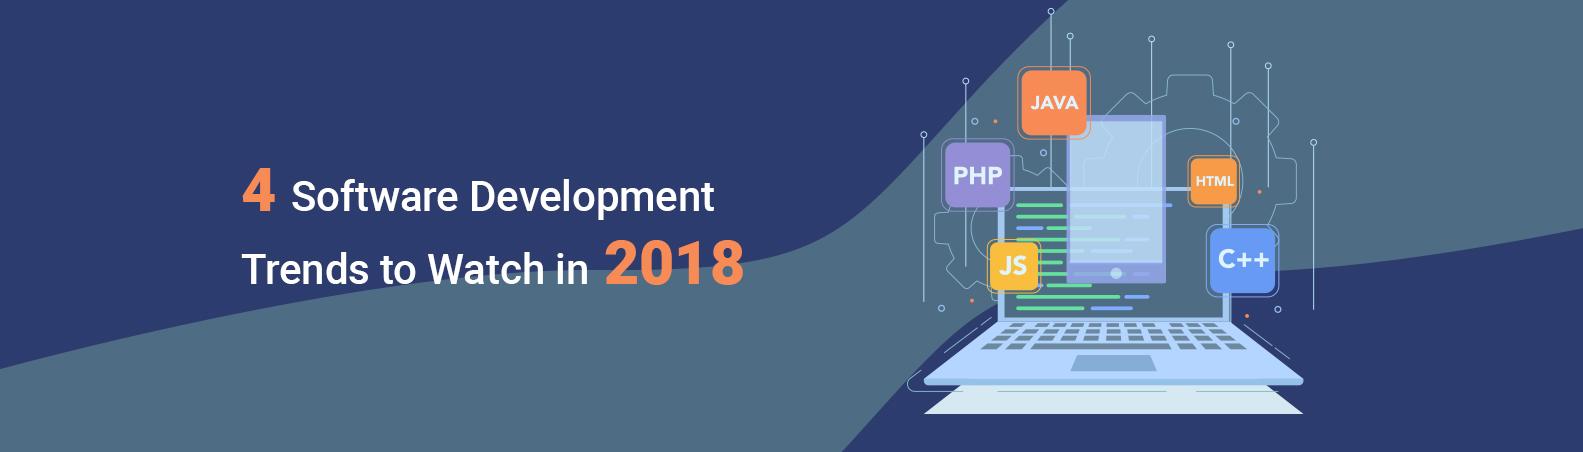 4 Software Development Trends to Watch in 2018